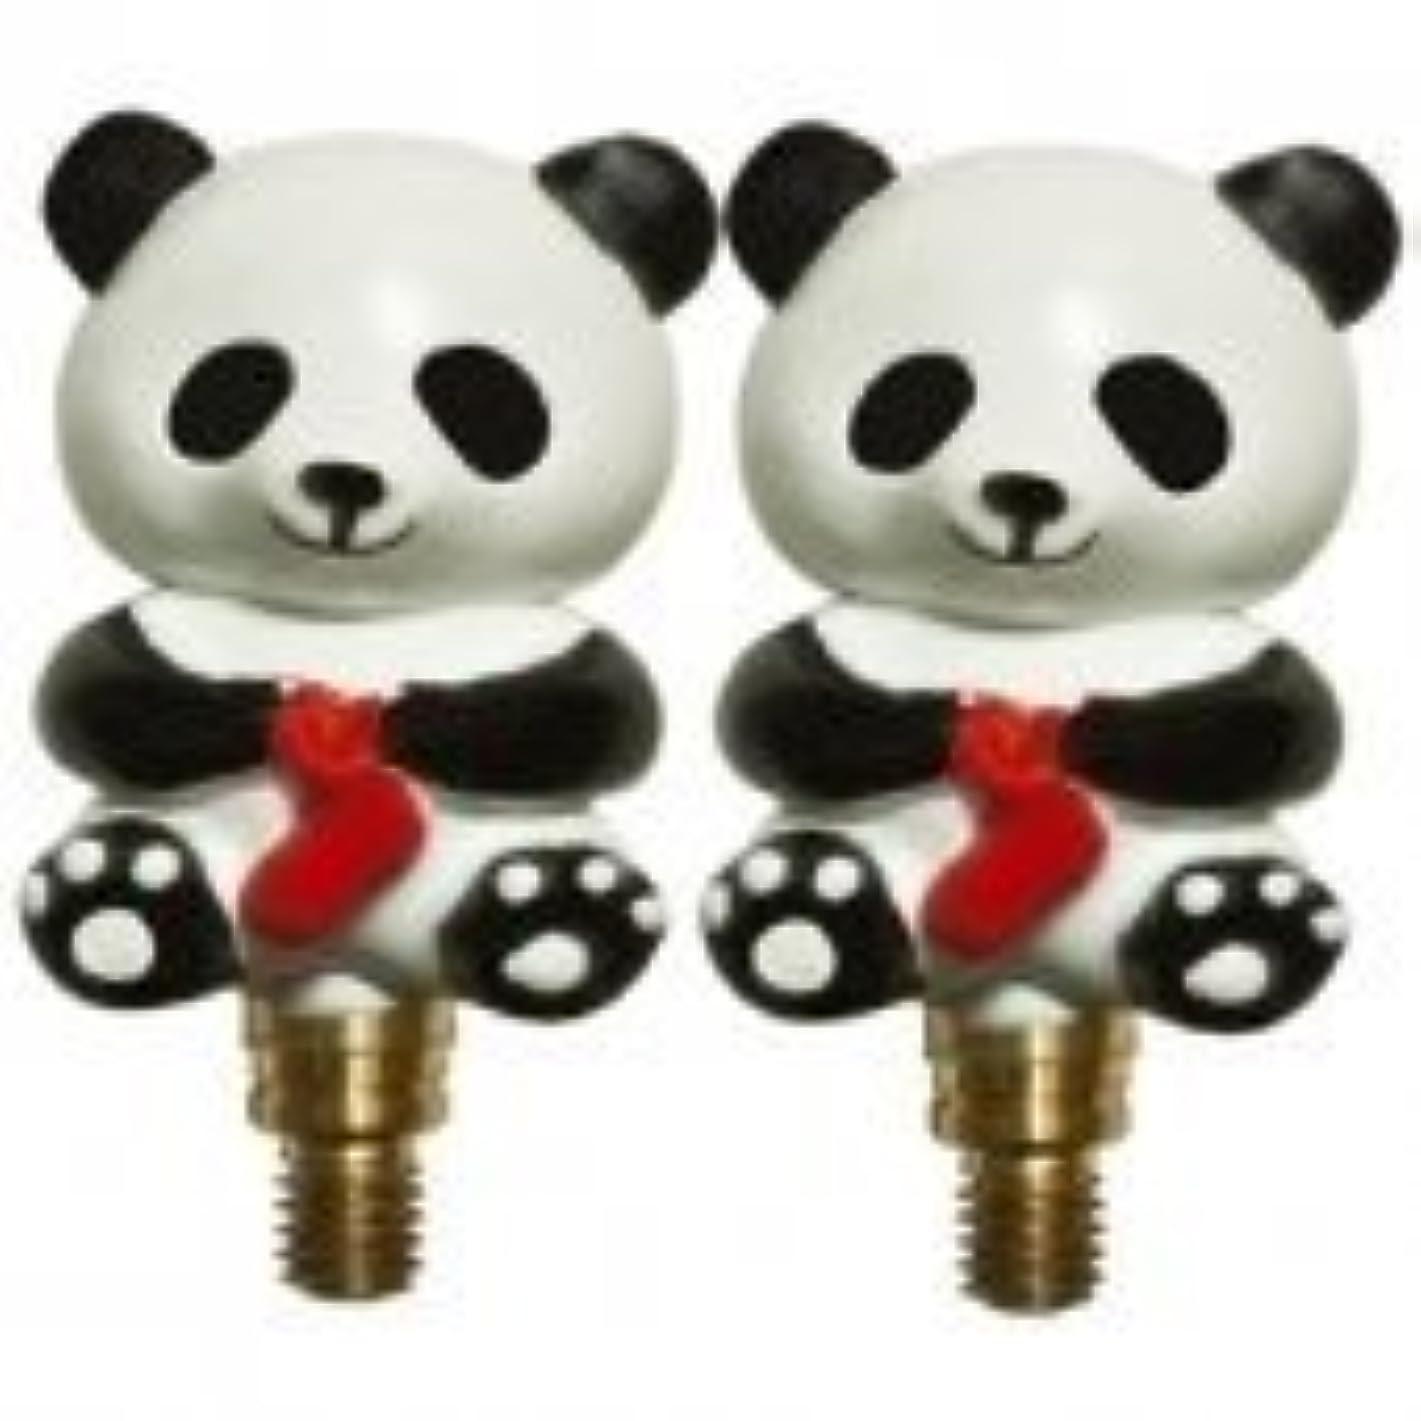 HiyaHiya Interchangeable Panda Cable Stoppers - Large